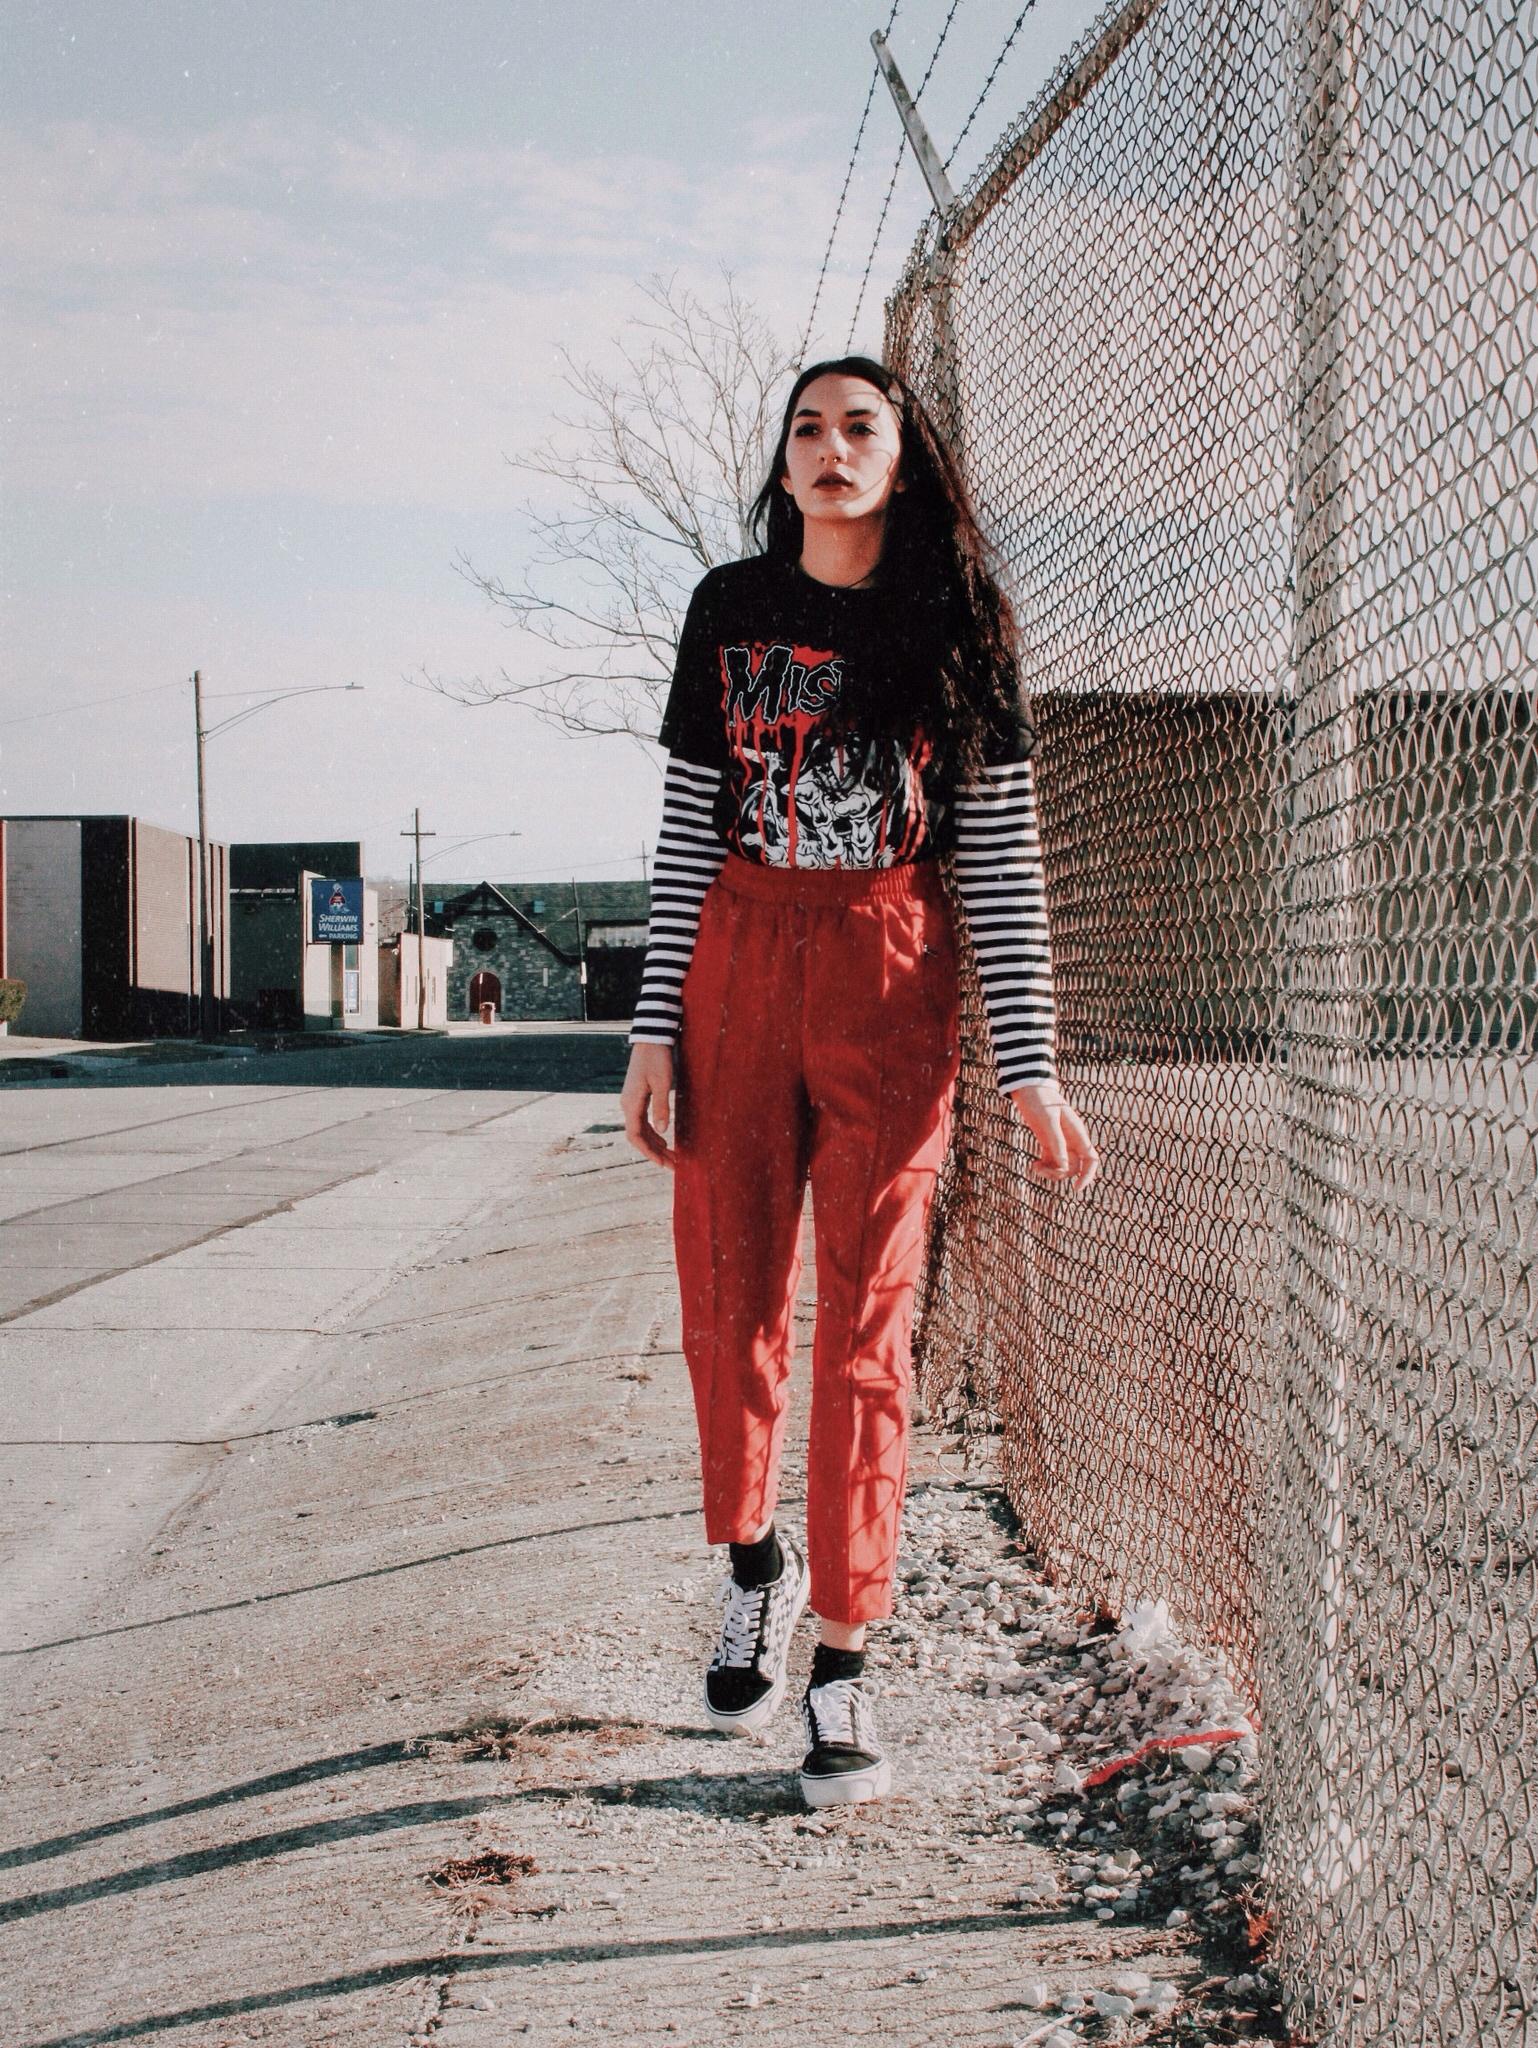 Misfit_Grunge_outfit_Aniyahlationn02